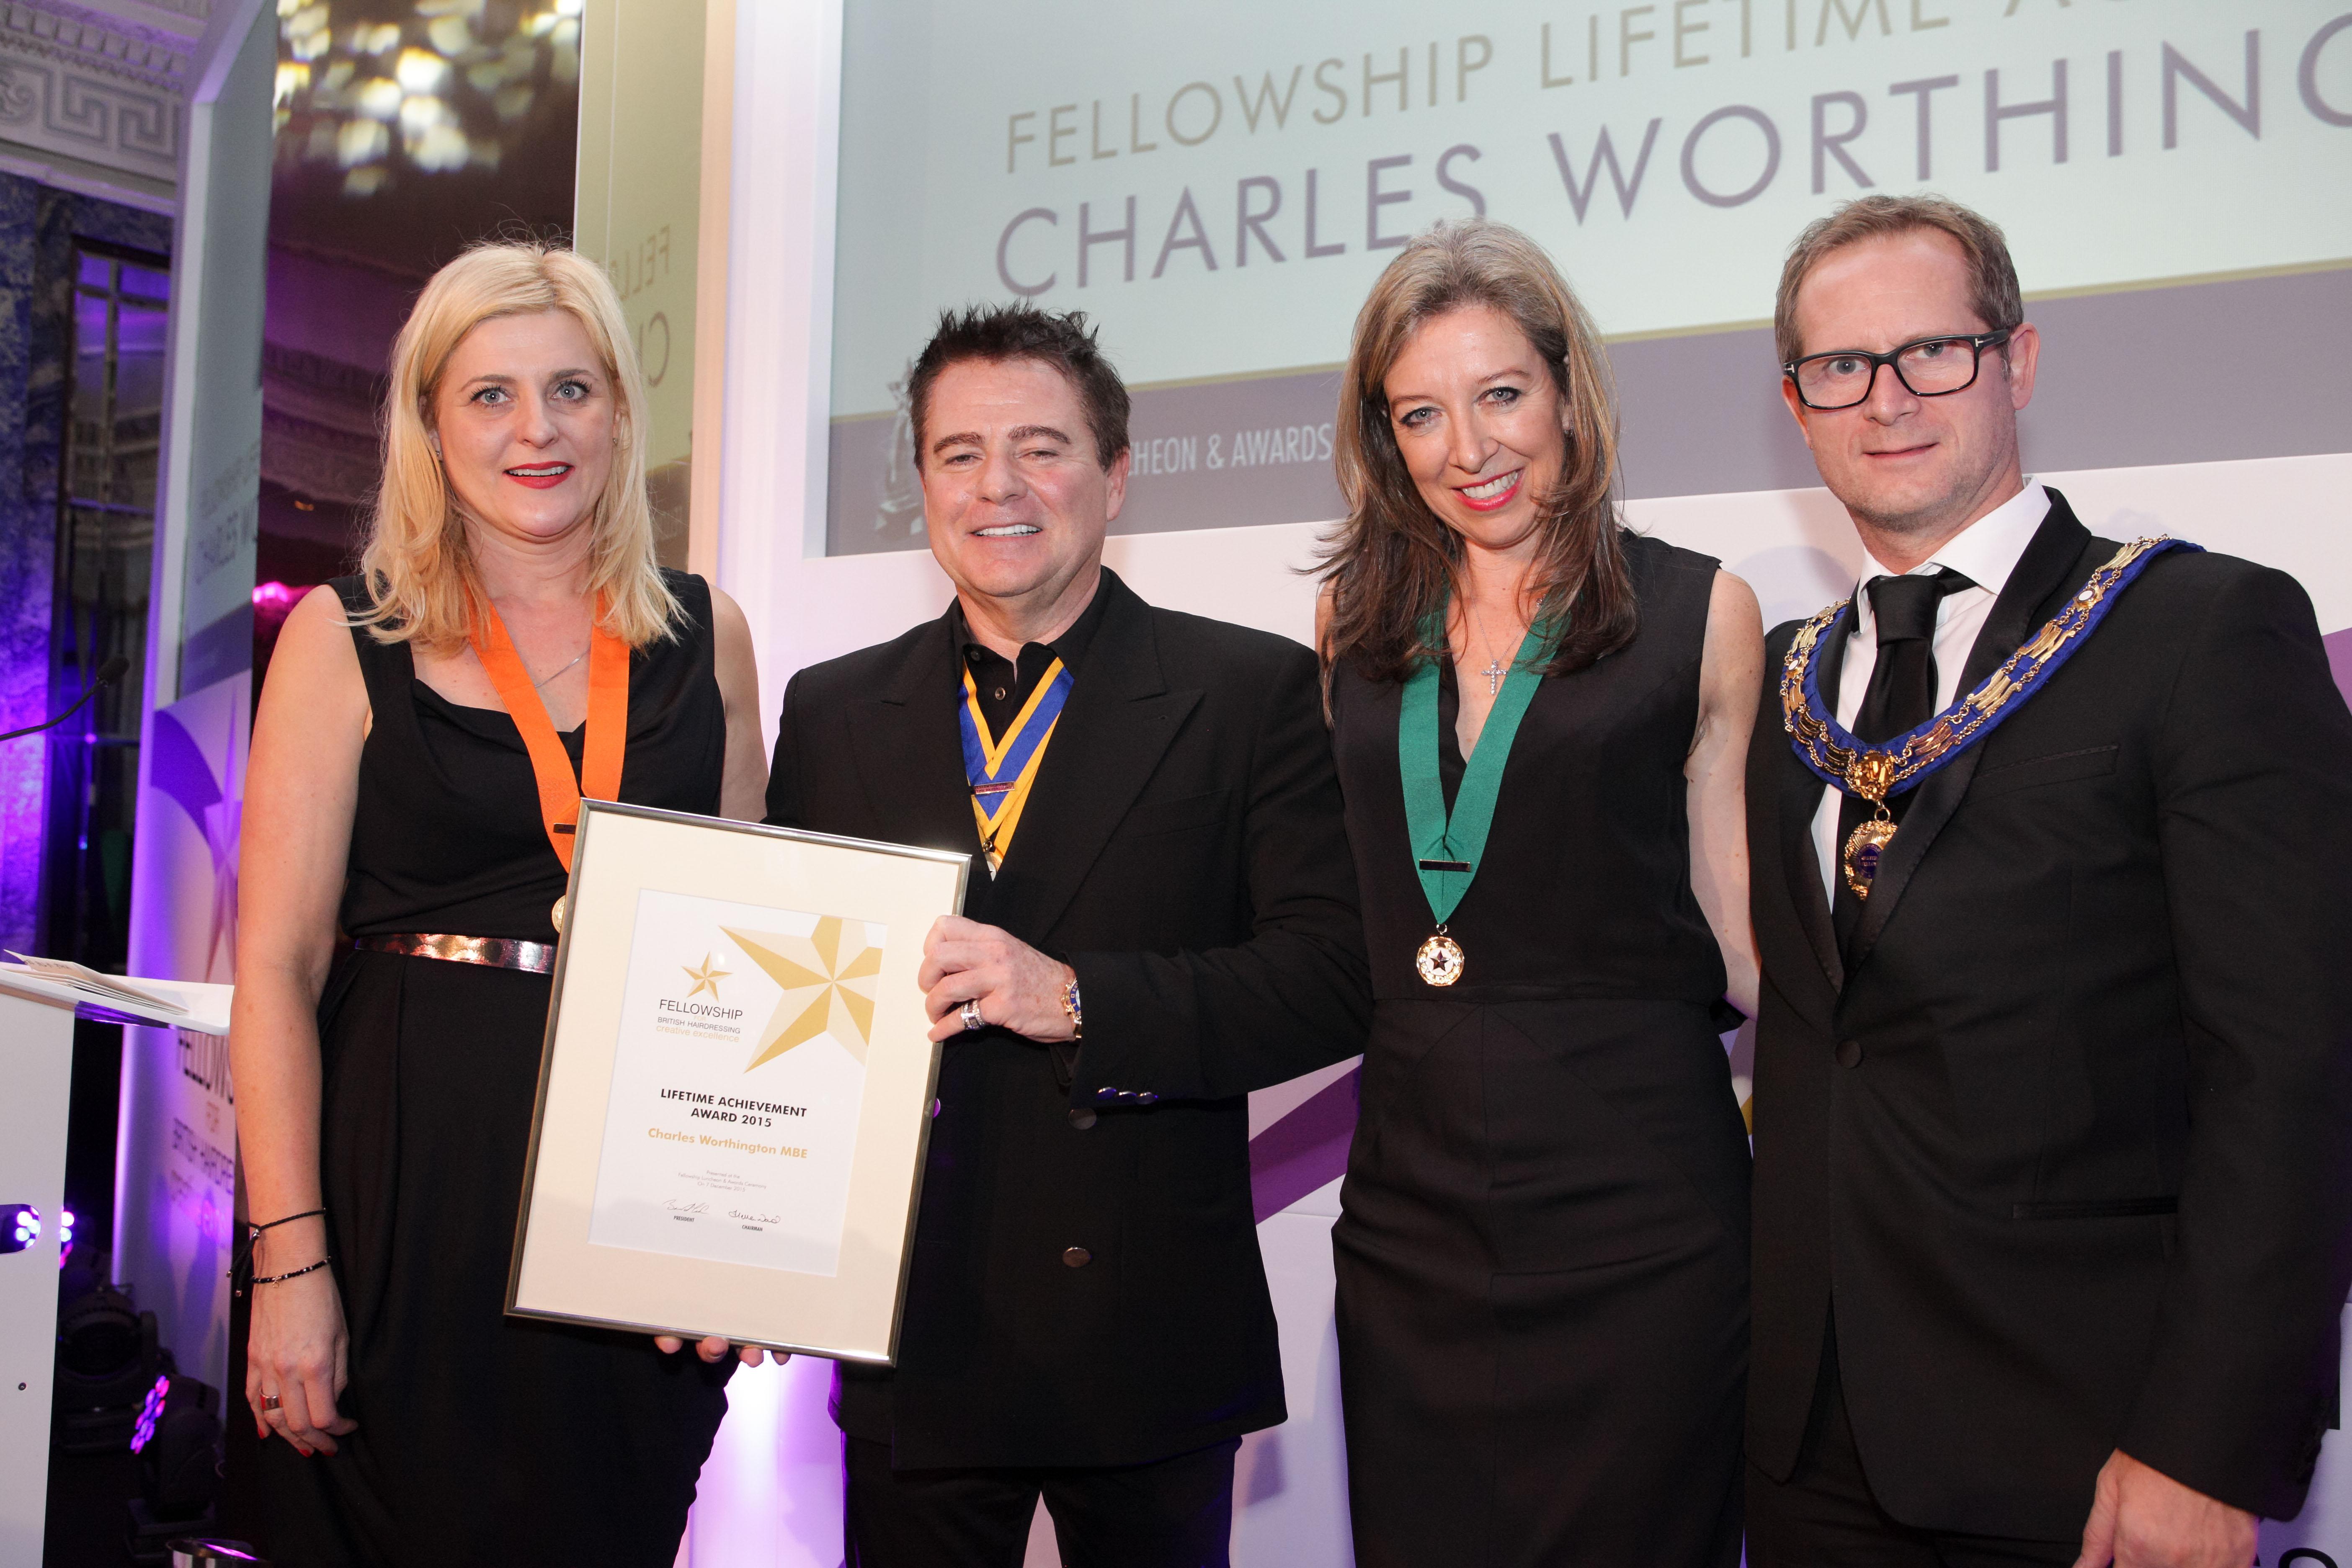 Charles Worthington lifetime achievement award